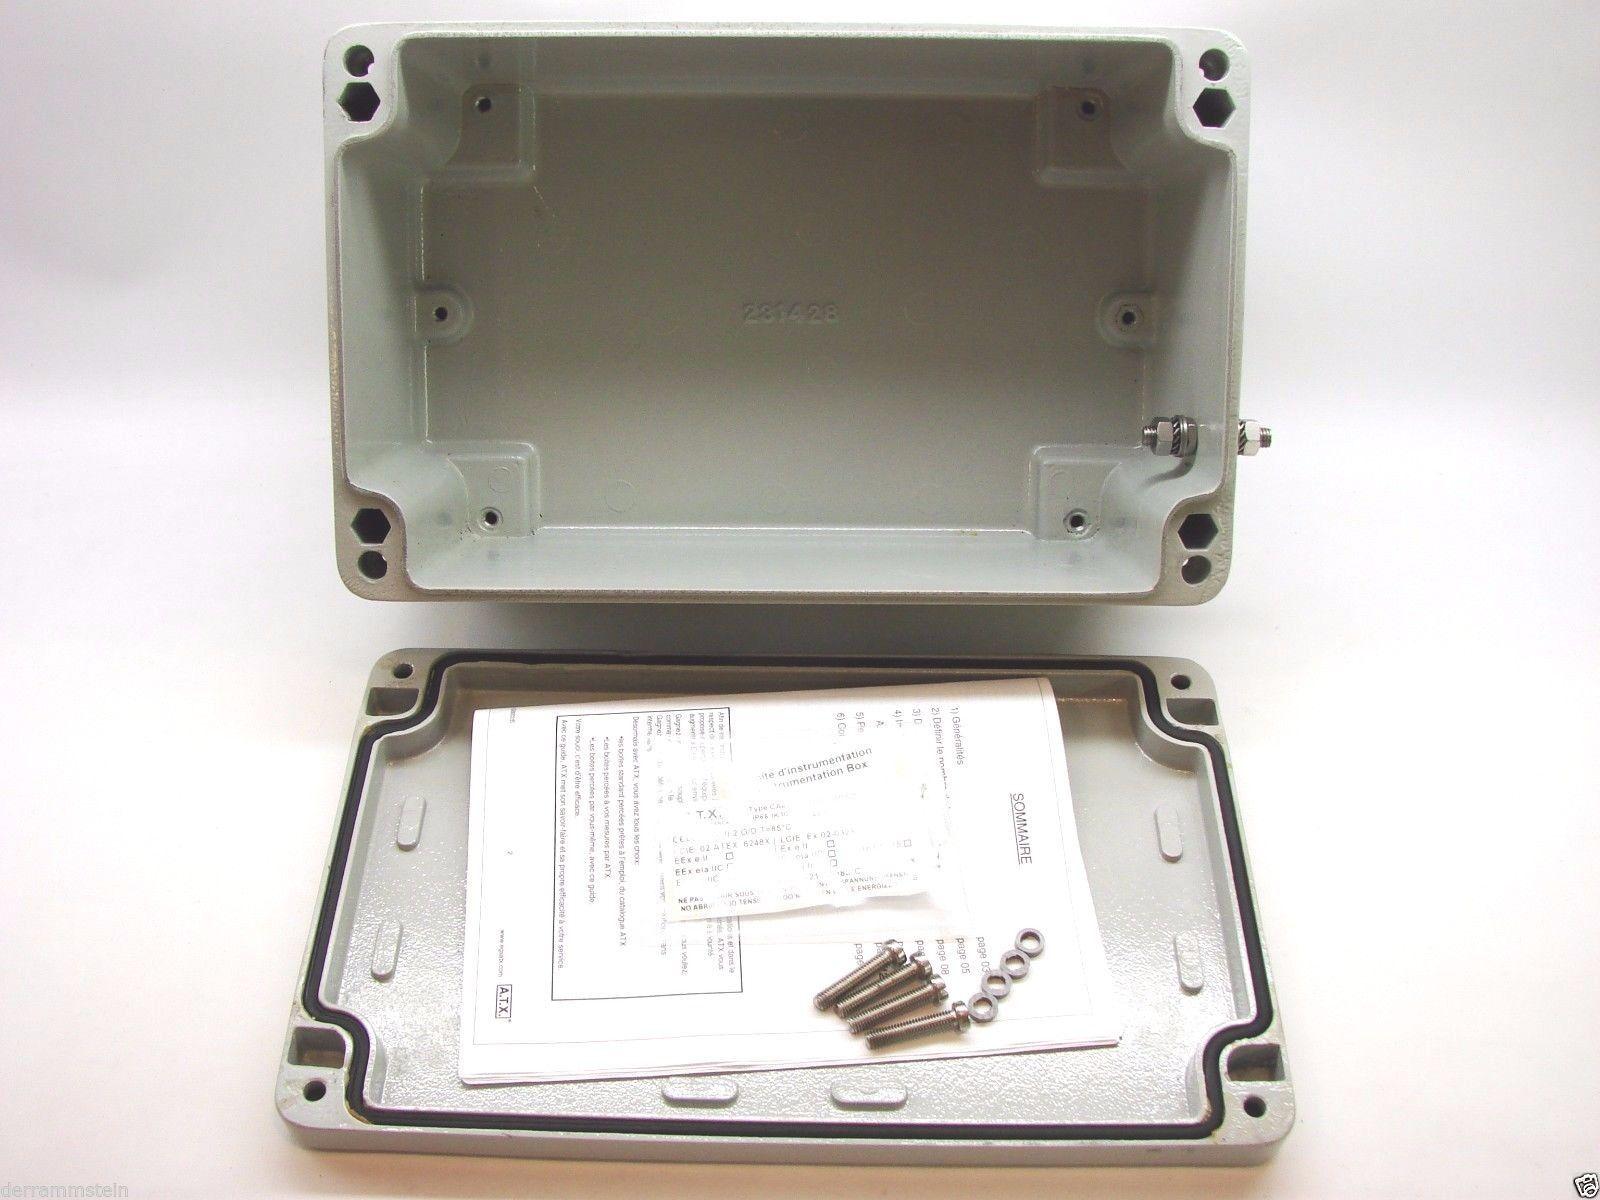 Appleton A.T.X. 095964/JBEA322013 Aluminum Junction Box Enclosure Zone 1&2 b118